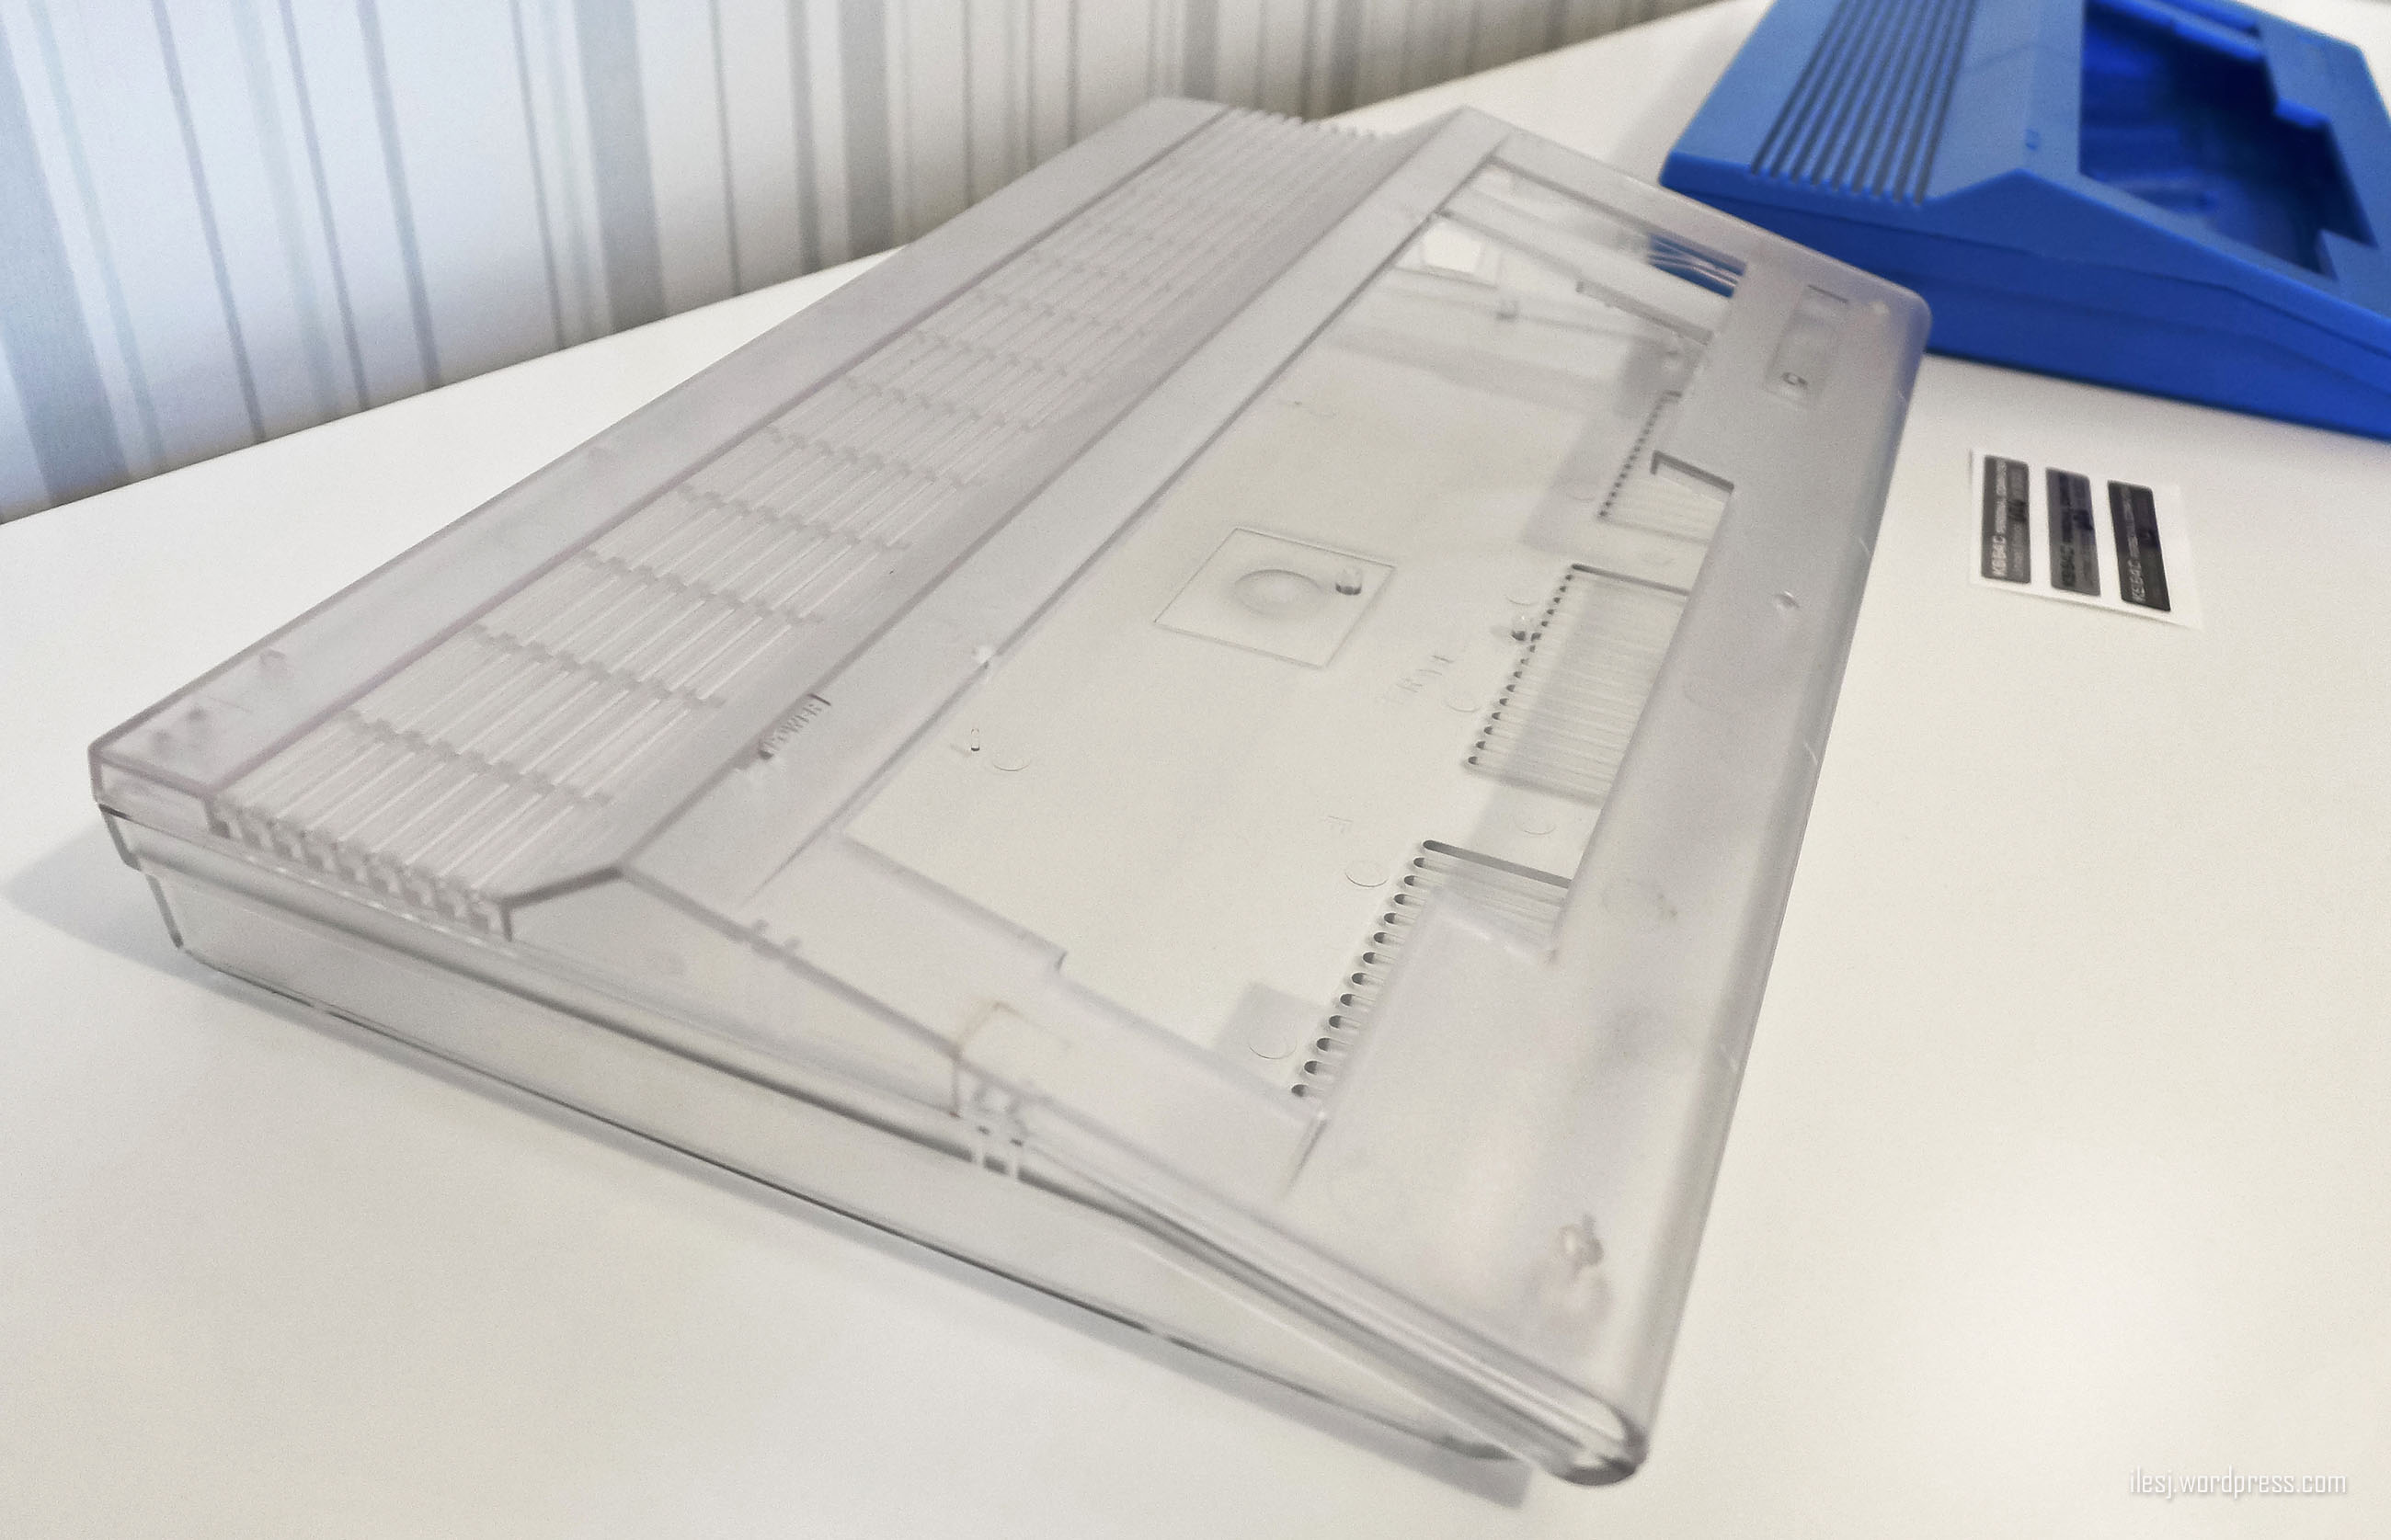 C64 Kickstarter Cases – With pictures! | ilesj's blog